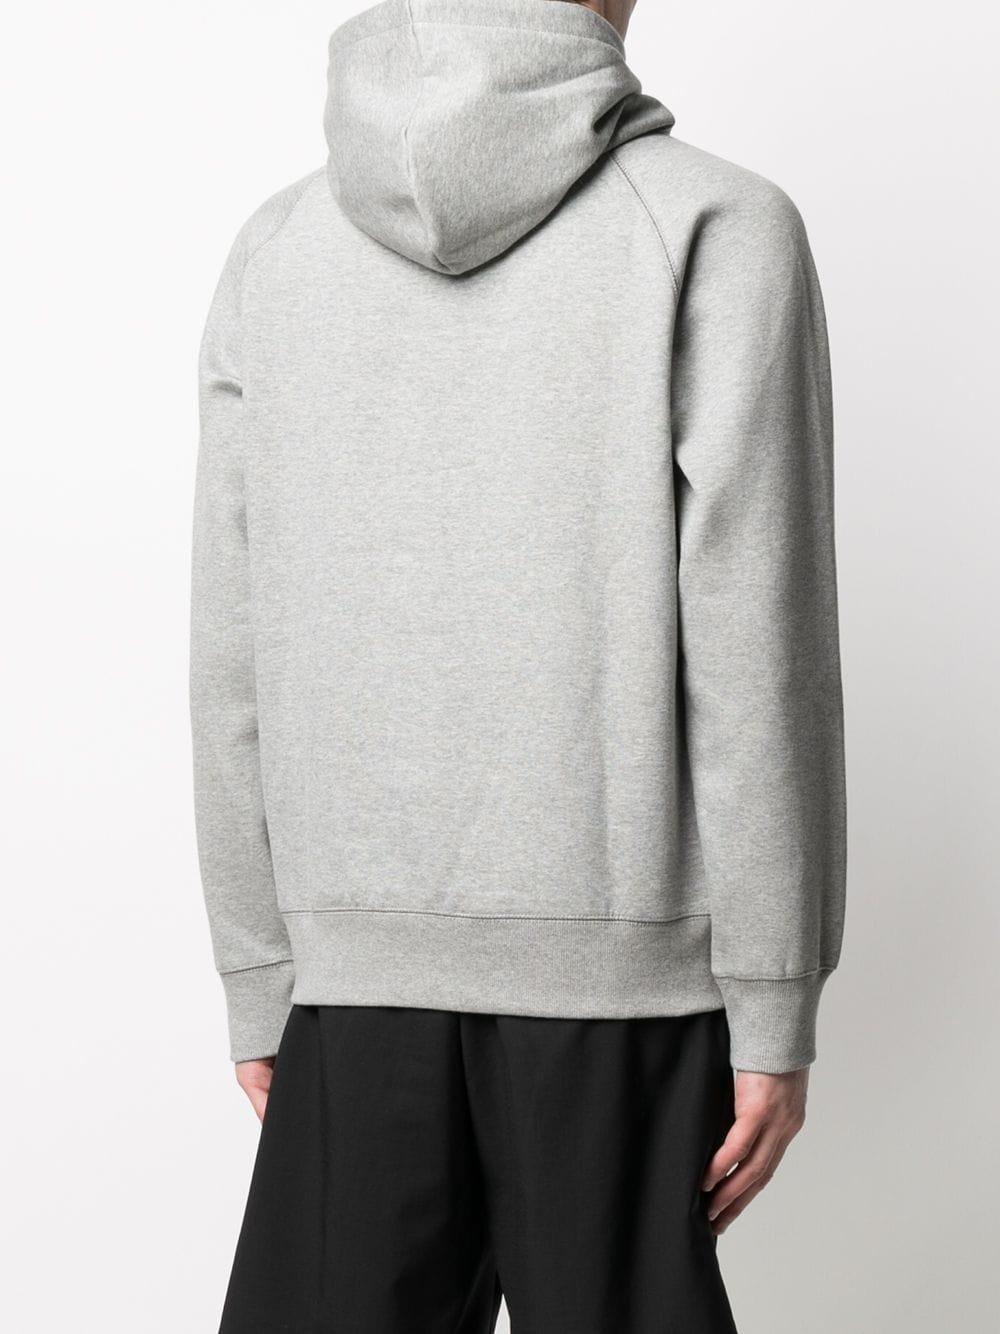 hooded chase sweat man gray in cotton CARHARTT WIP | Sweatshirts | I02638400M.XX